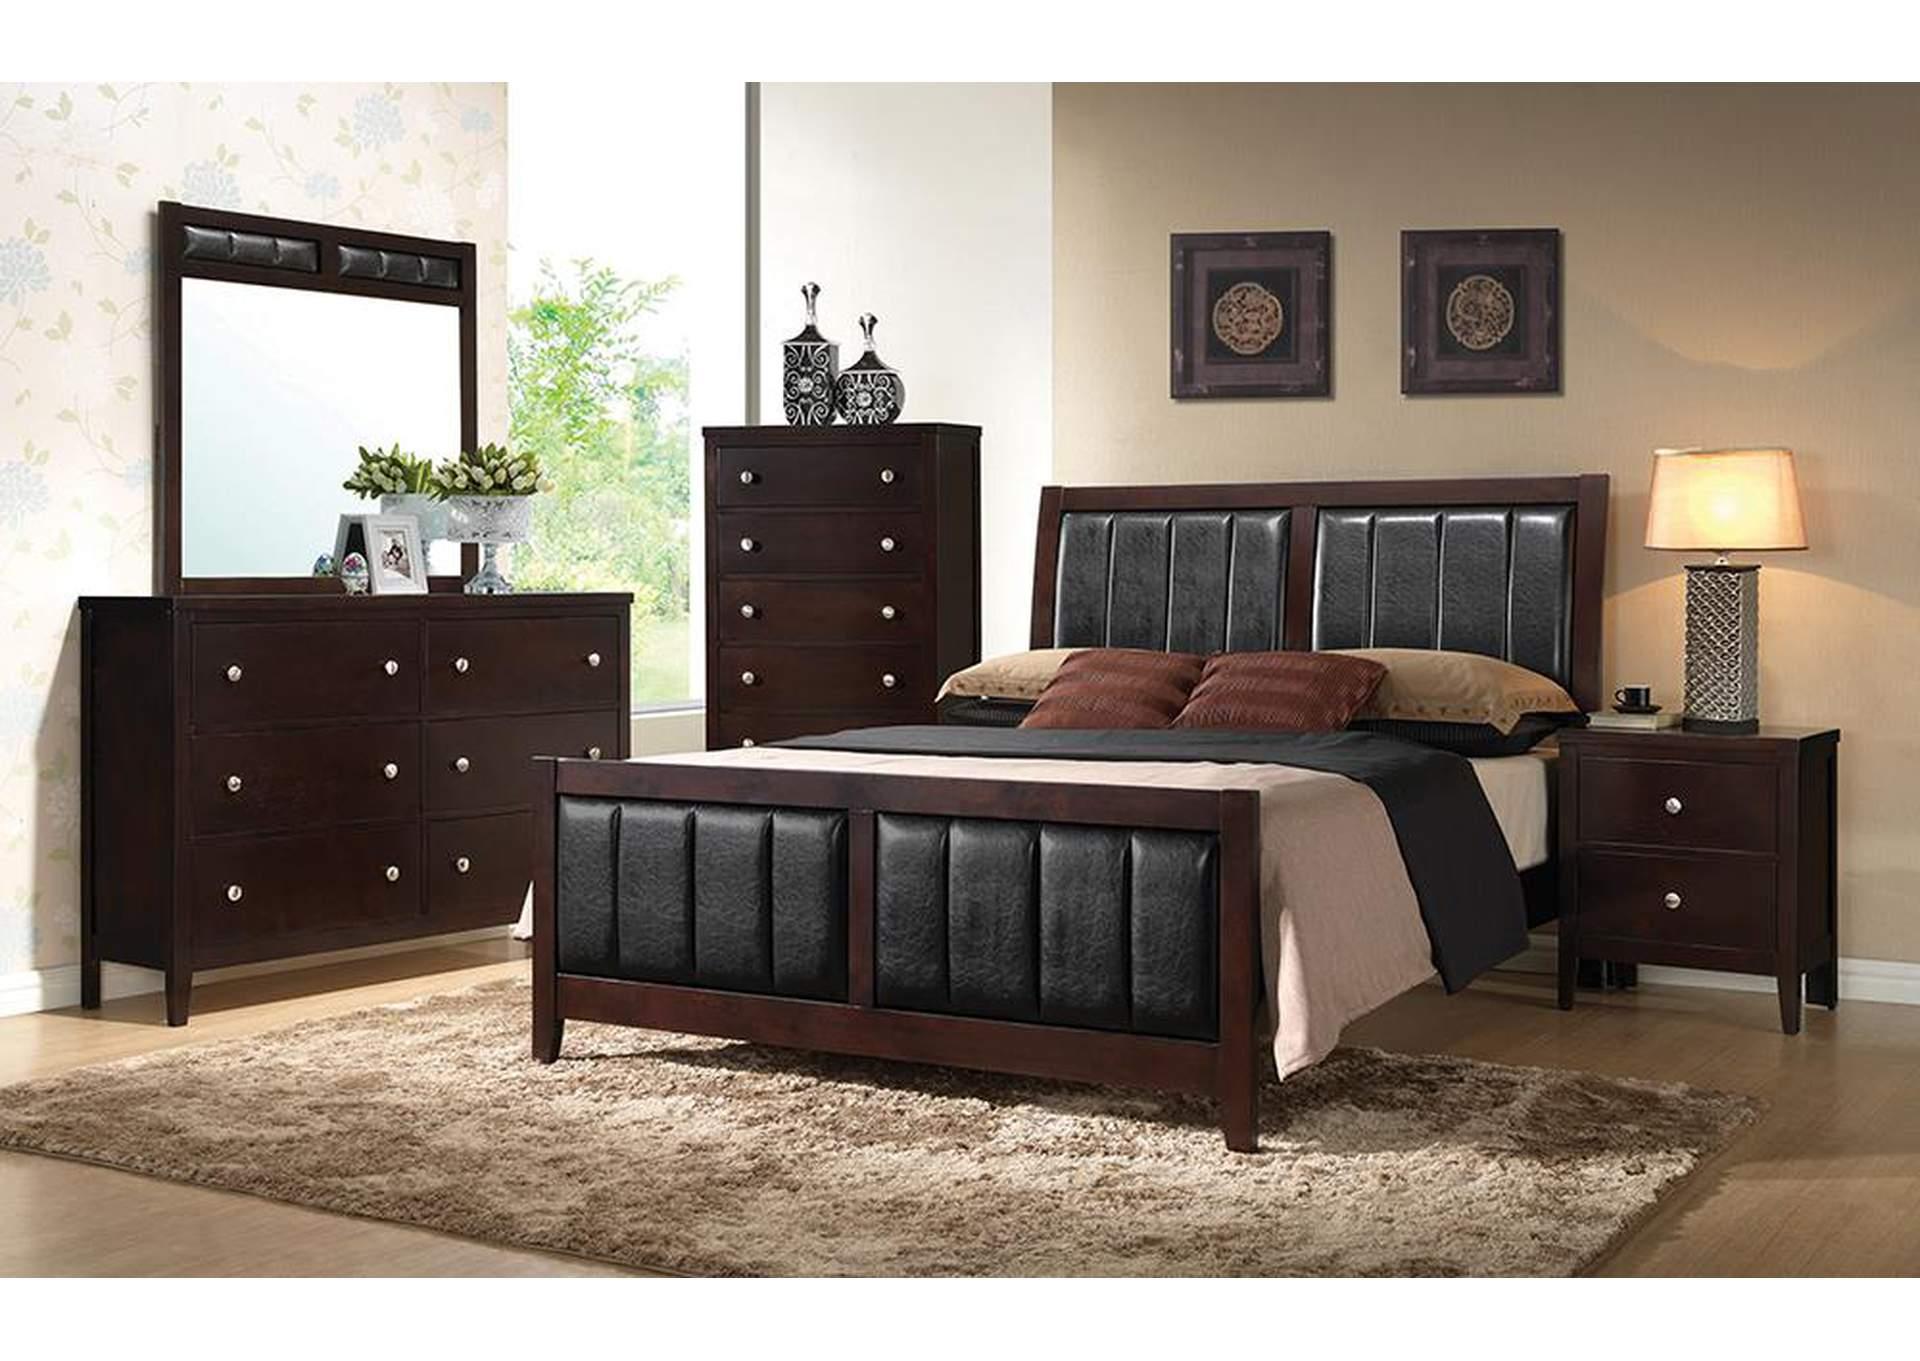 Twin 4 Piece Bedroom Set National Furniture Outlet Westwego La